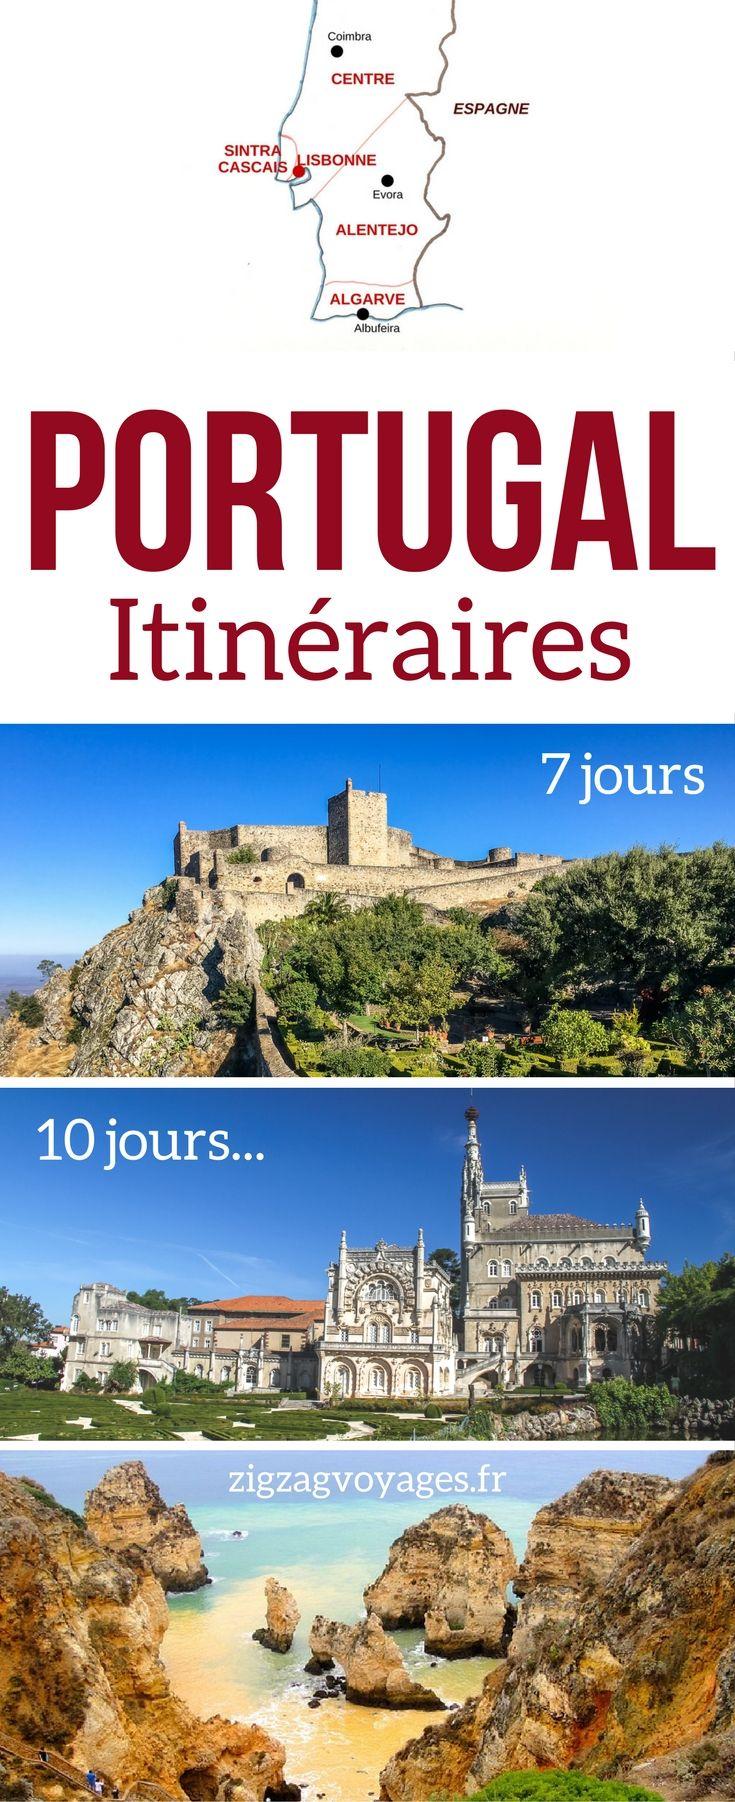 les 148 meilleures images du tableau portugal voyage portugal paysages sur pinterest 10. Black Bedroom Furniture Sets. Home Design Ideas